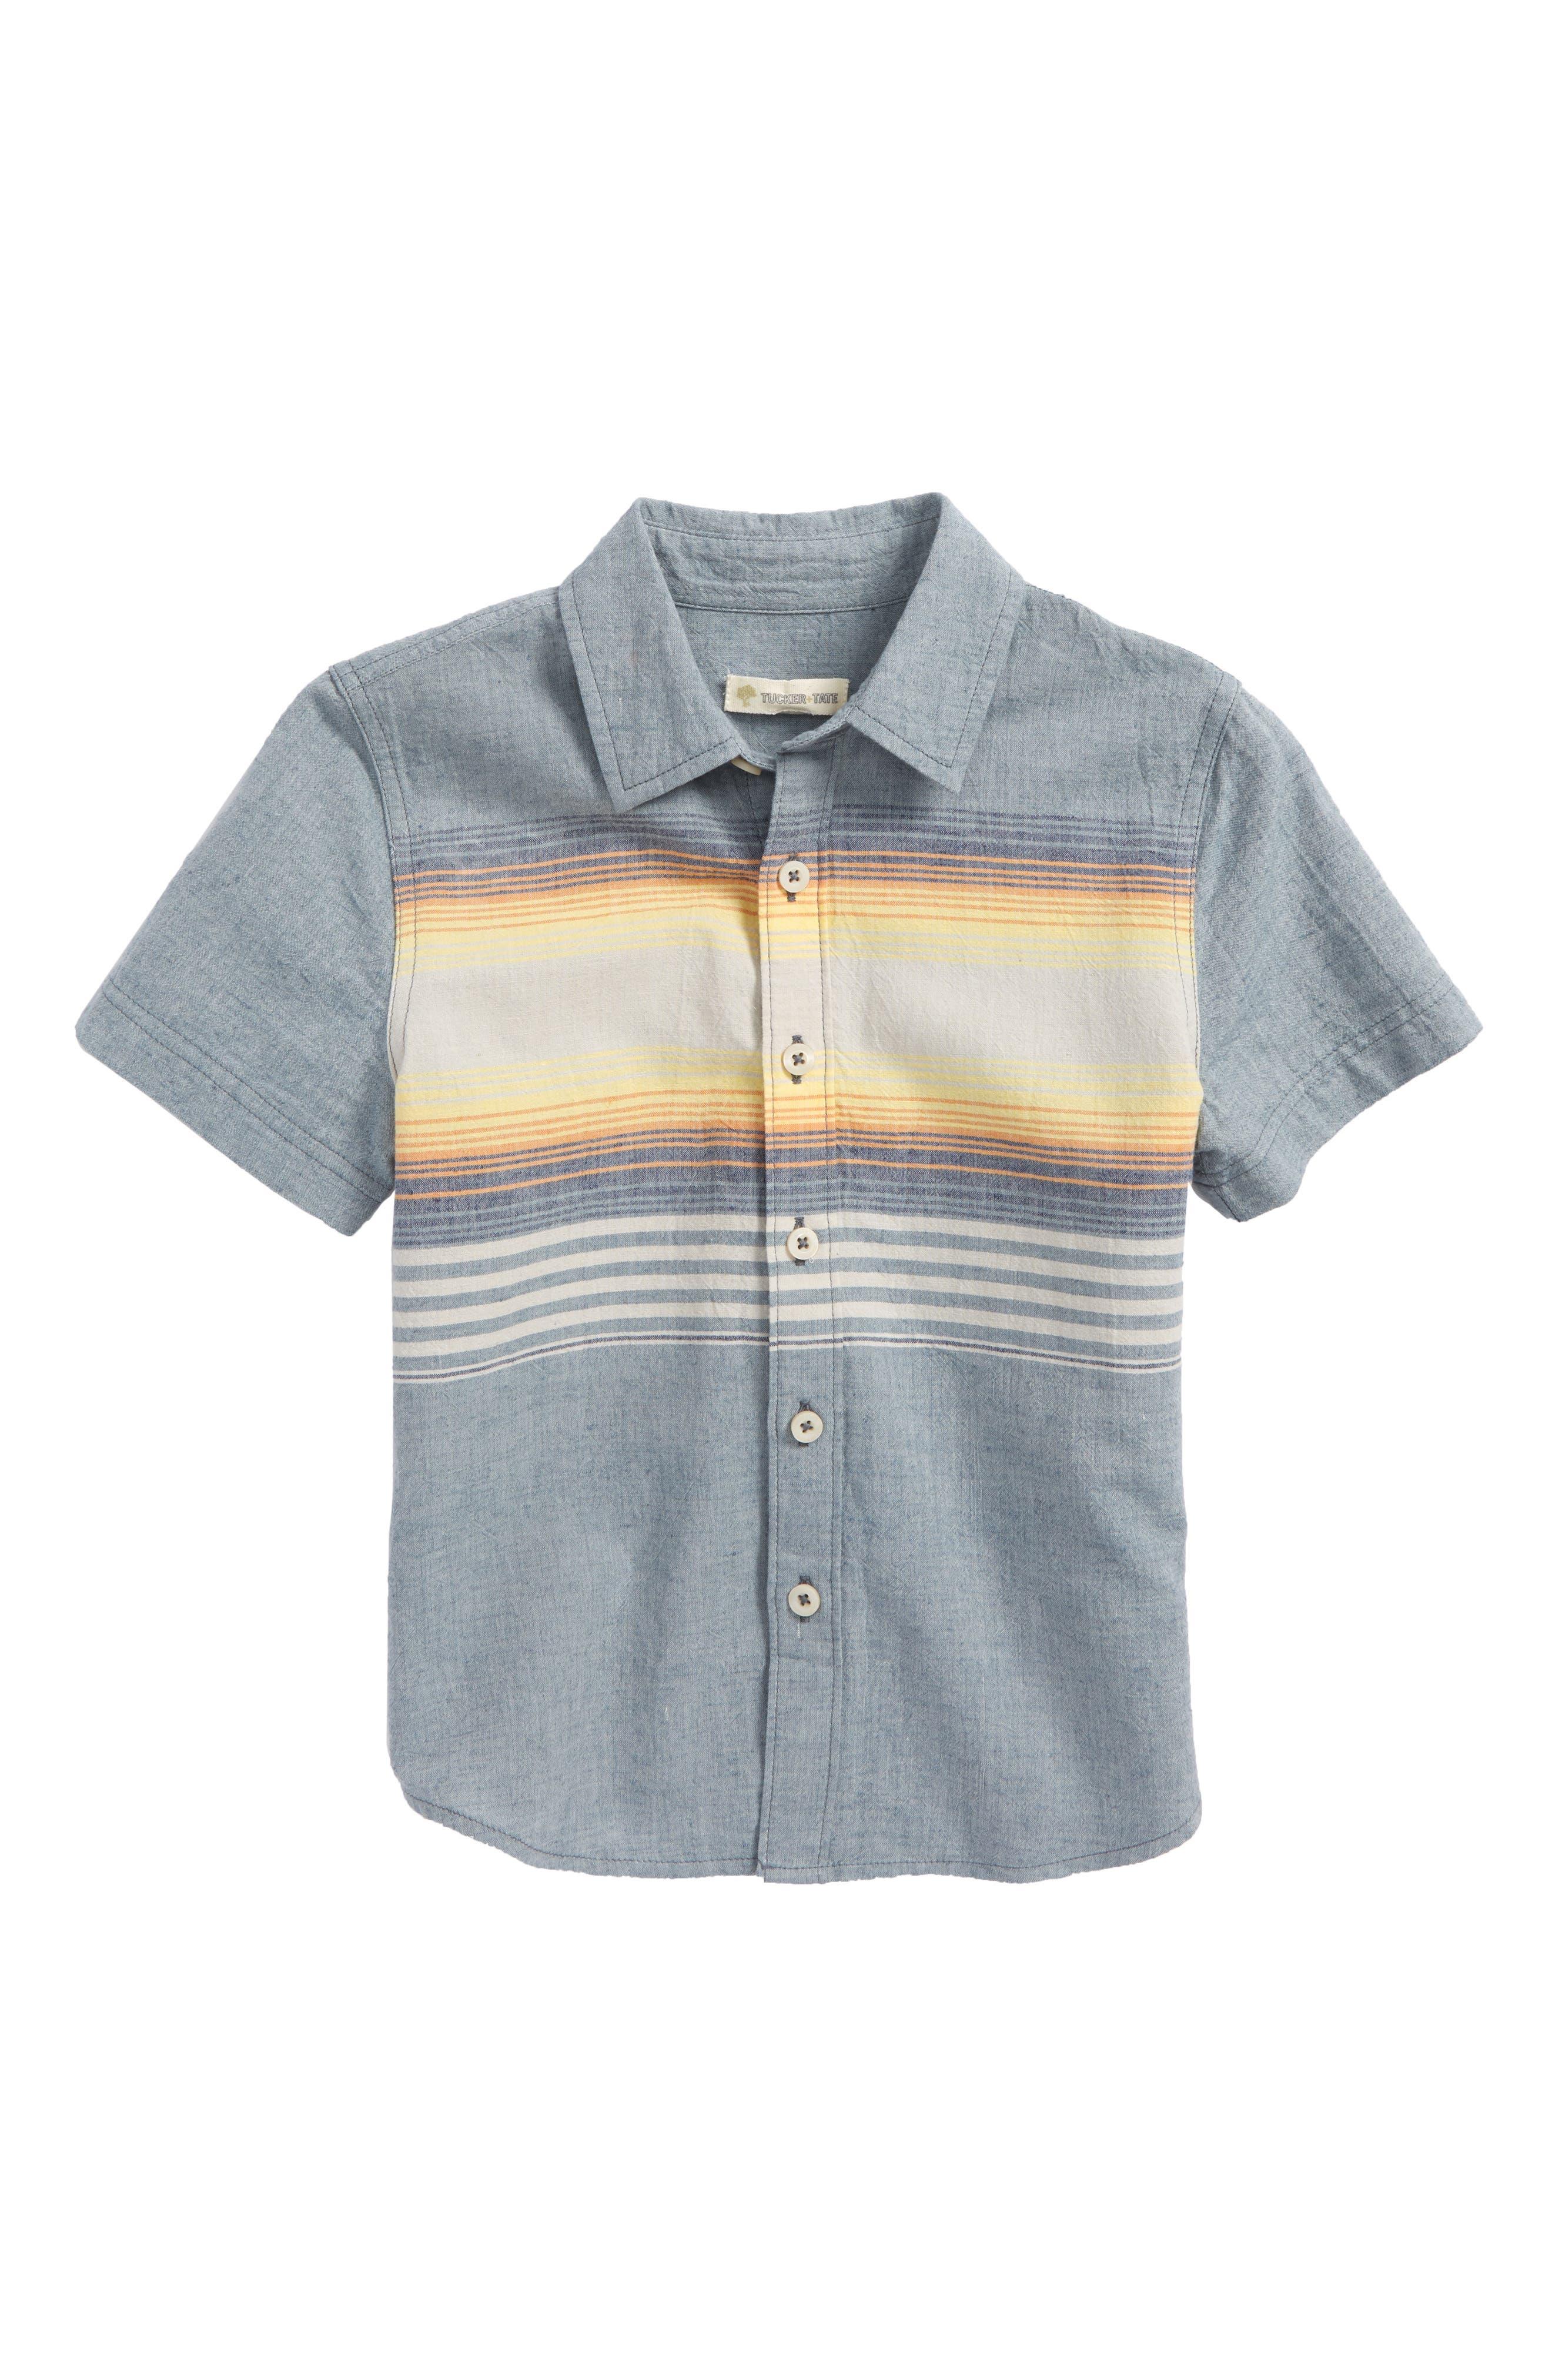 Chambray Stripe Shirt,                             Main thumbnail 1, color,                             Blue Chambray Sunset Stripe